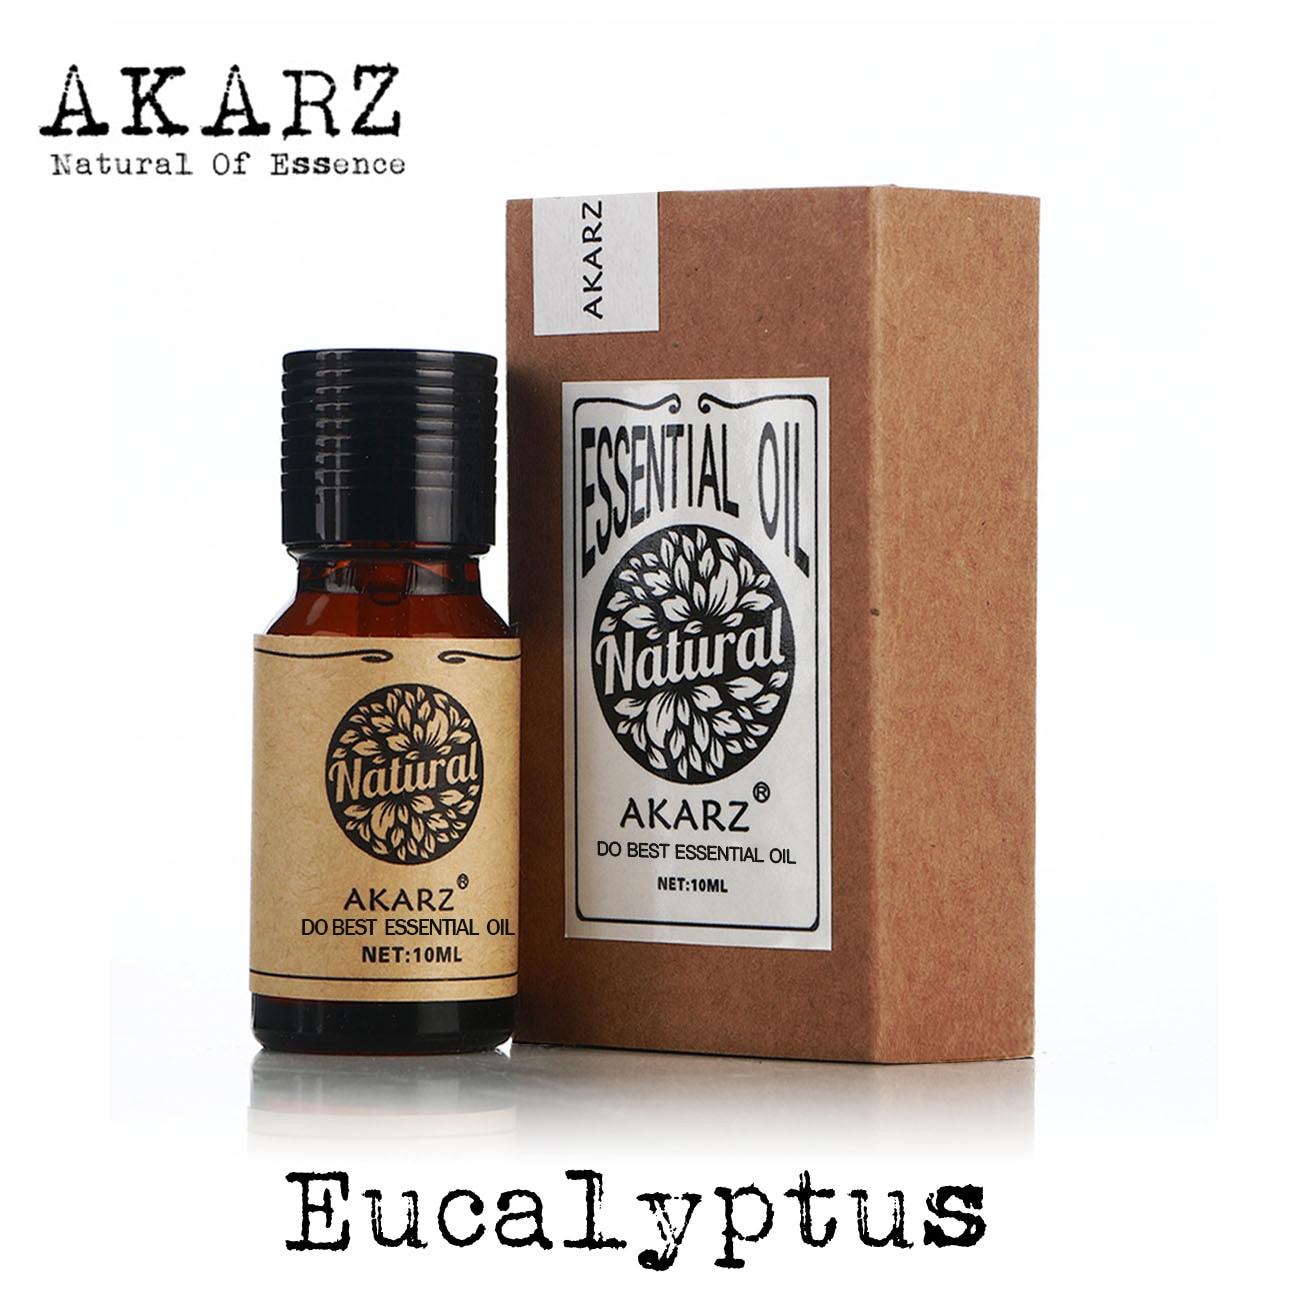 AKARZ מפורסם מותג אקליפטוס חיוני שמן יופי טיפול להקל על גודש באף כאב ראש לחסל שרירים כאב אקליפטוס שמן